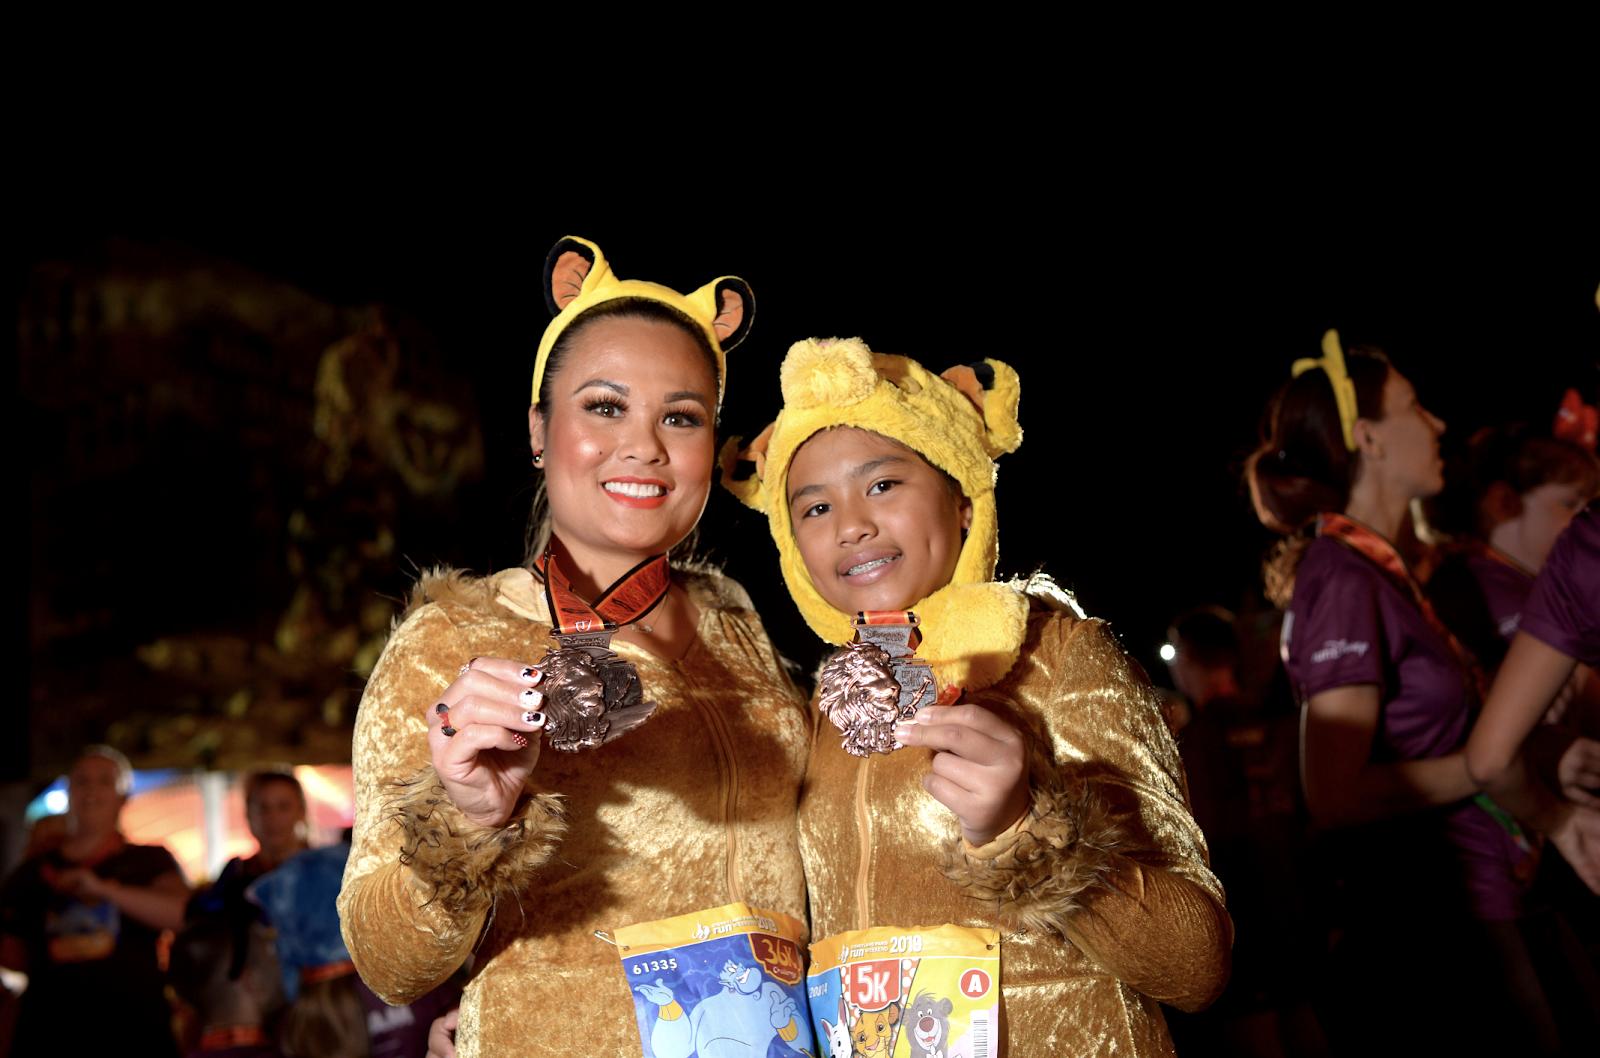 Disneyland Paris Run Weekend is a Grand Adventure for All!